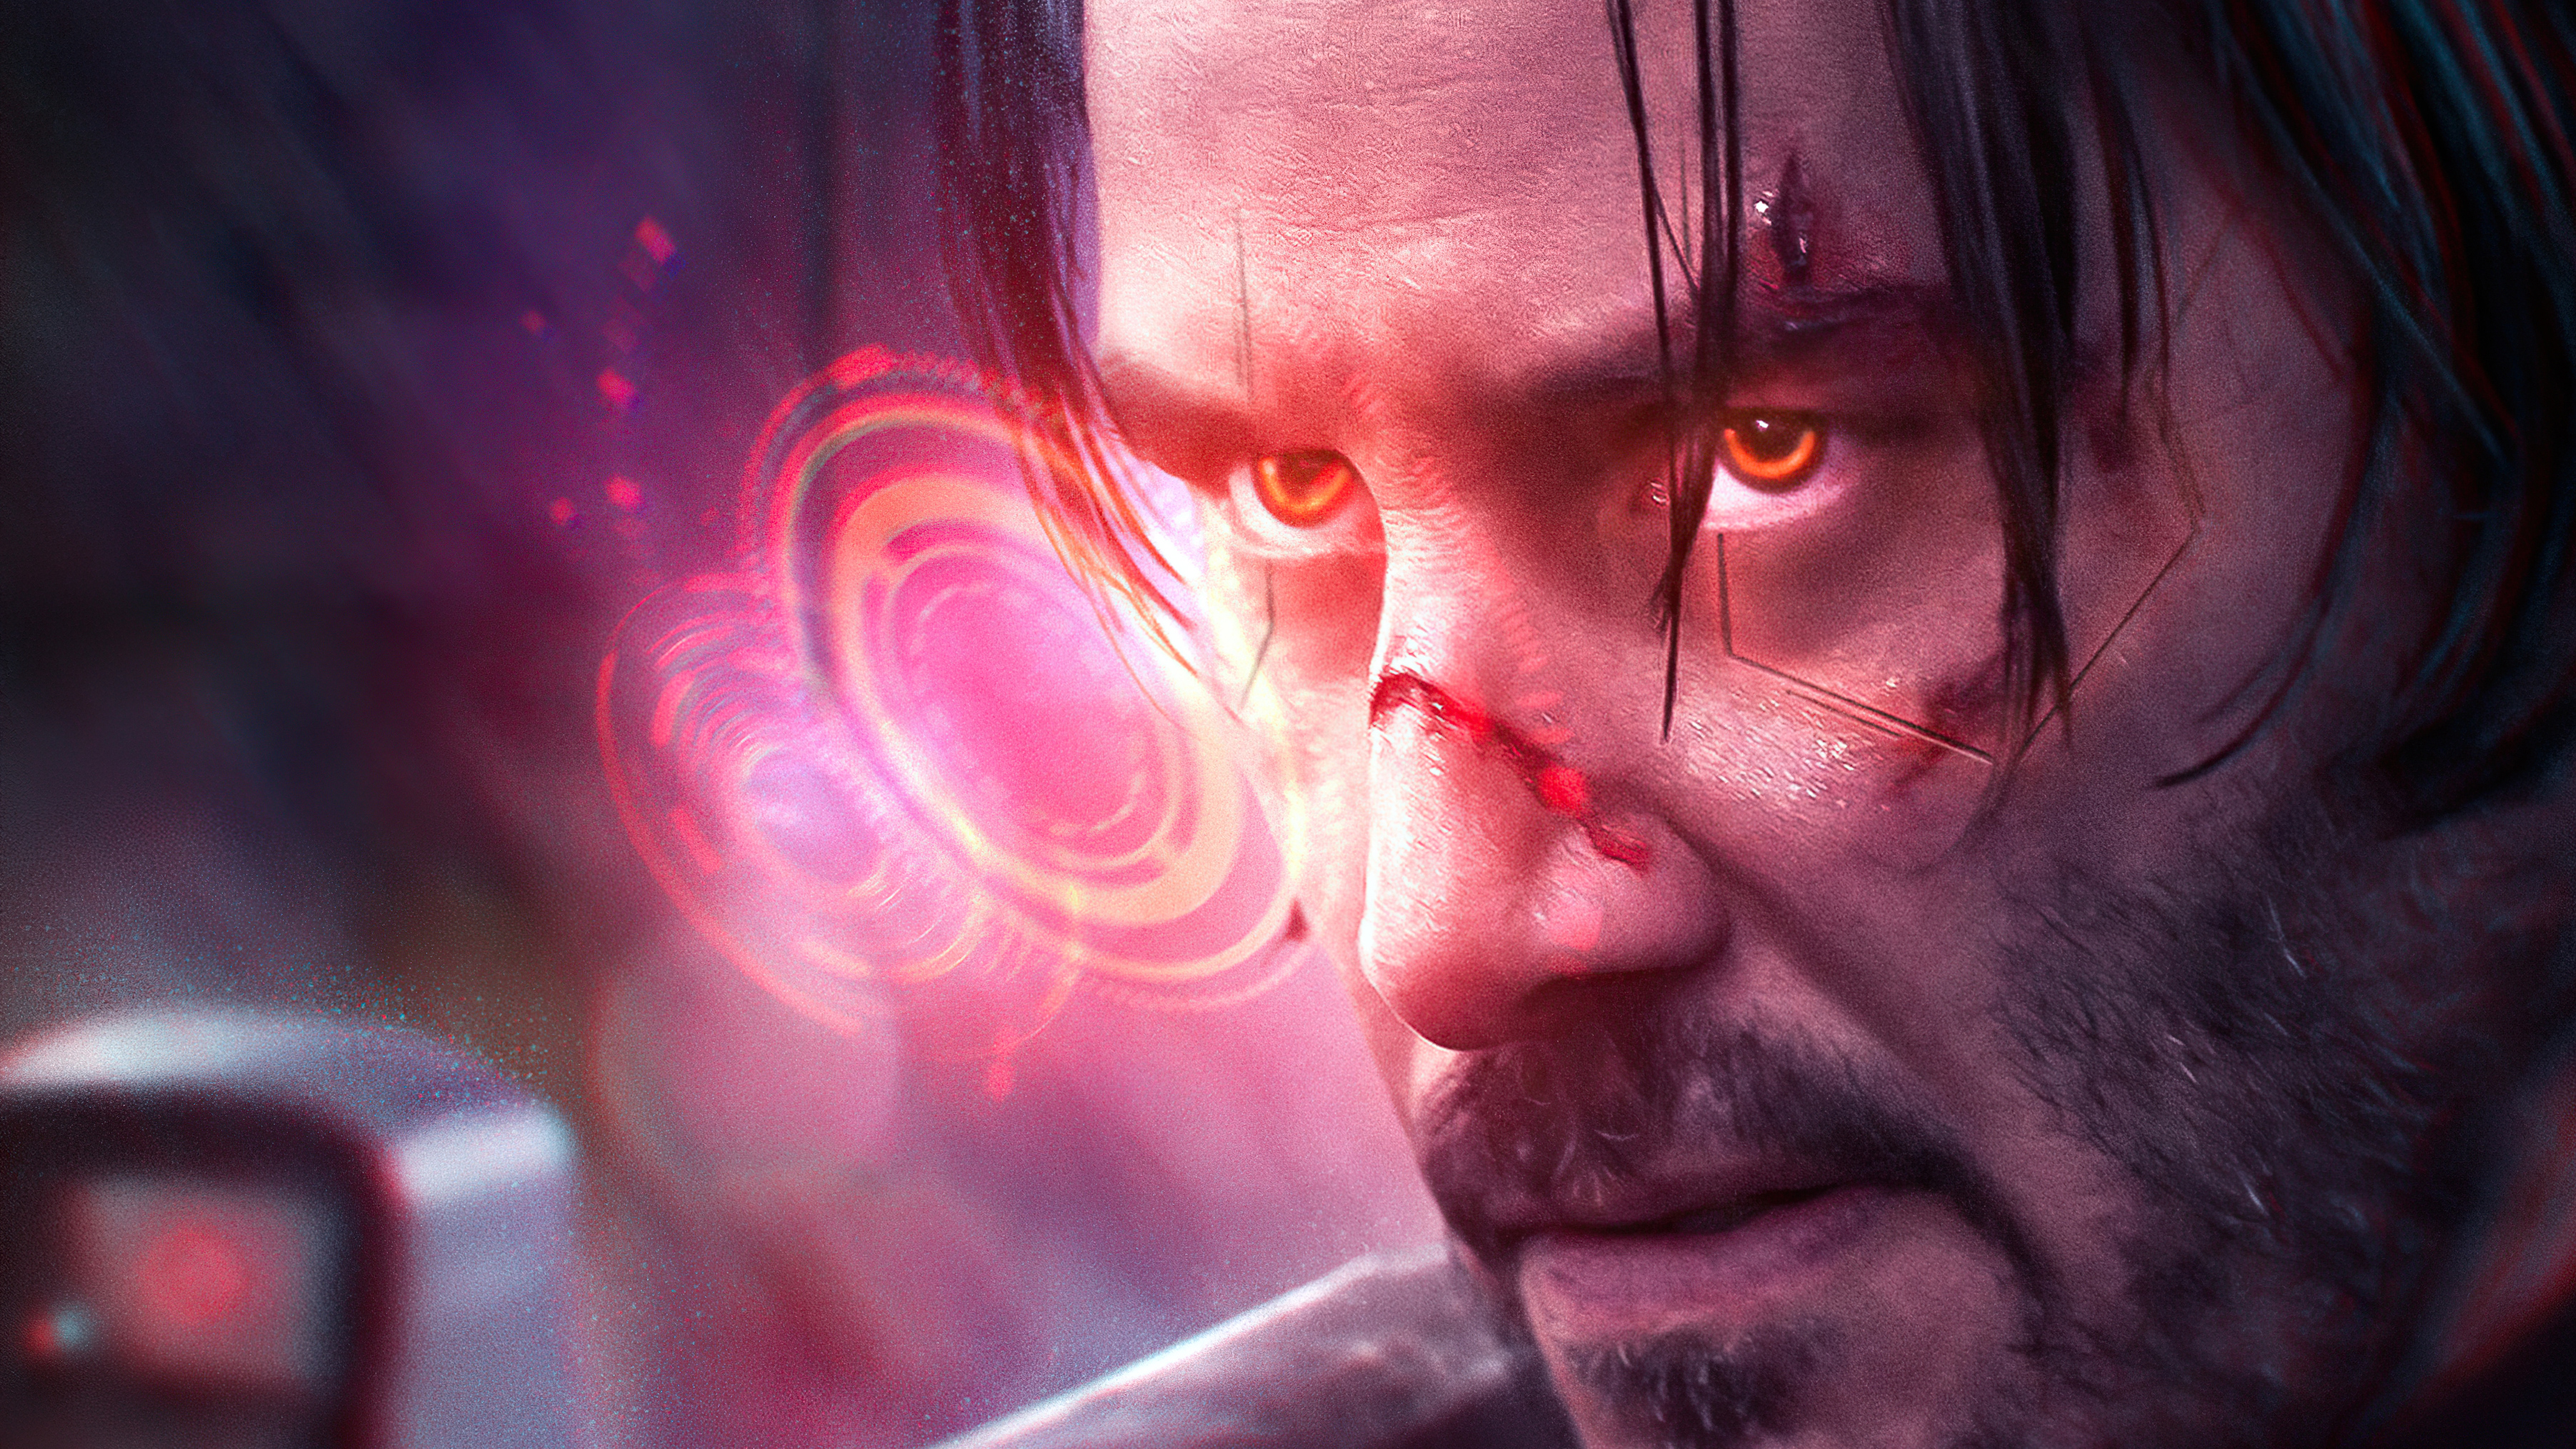 Wallpaper Keanu Reeves Cyberpunk 2077